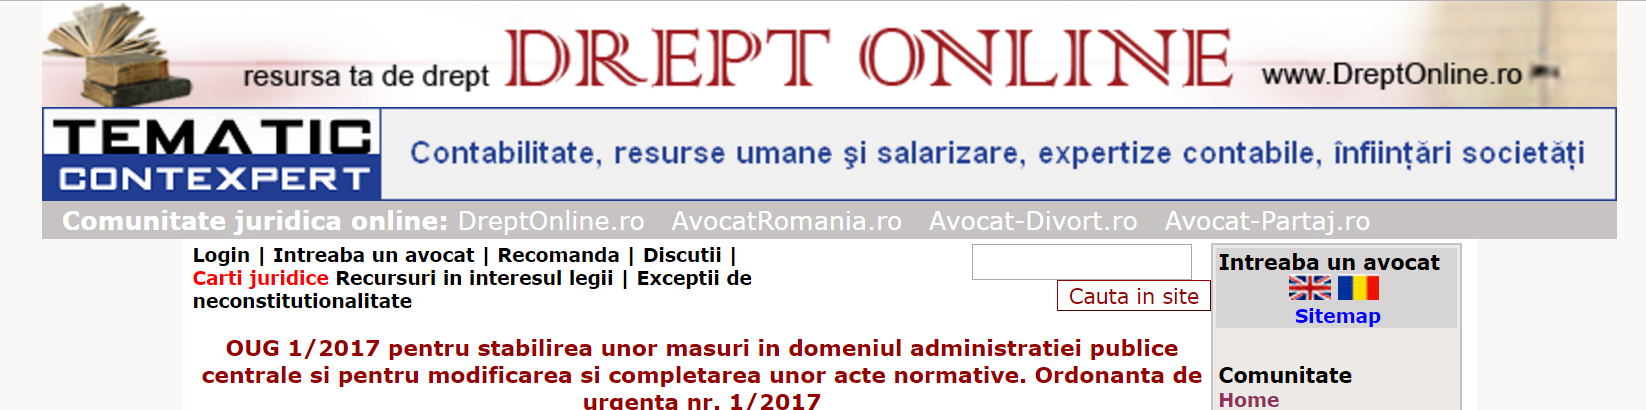 drept-online